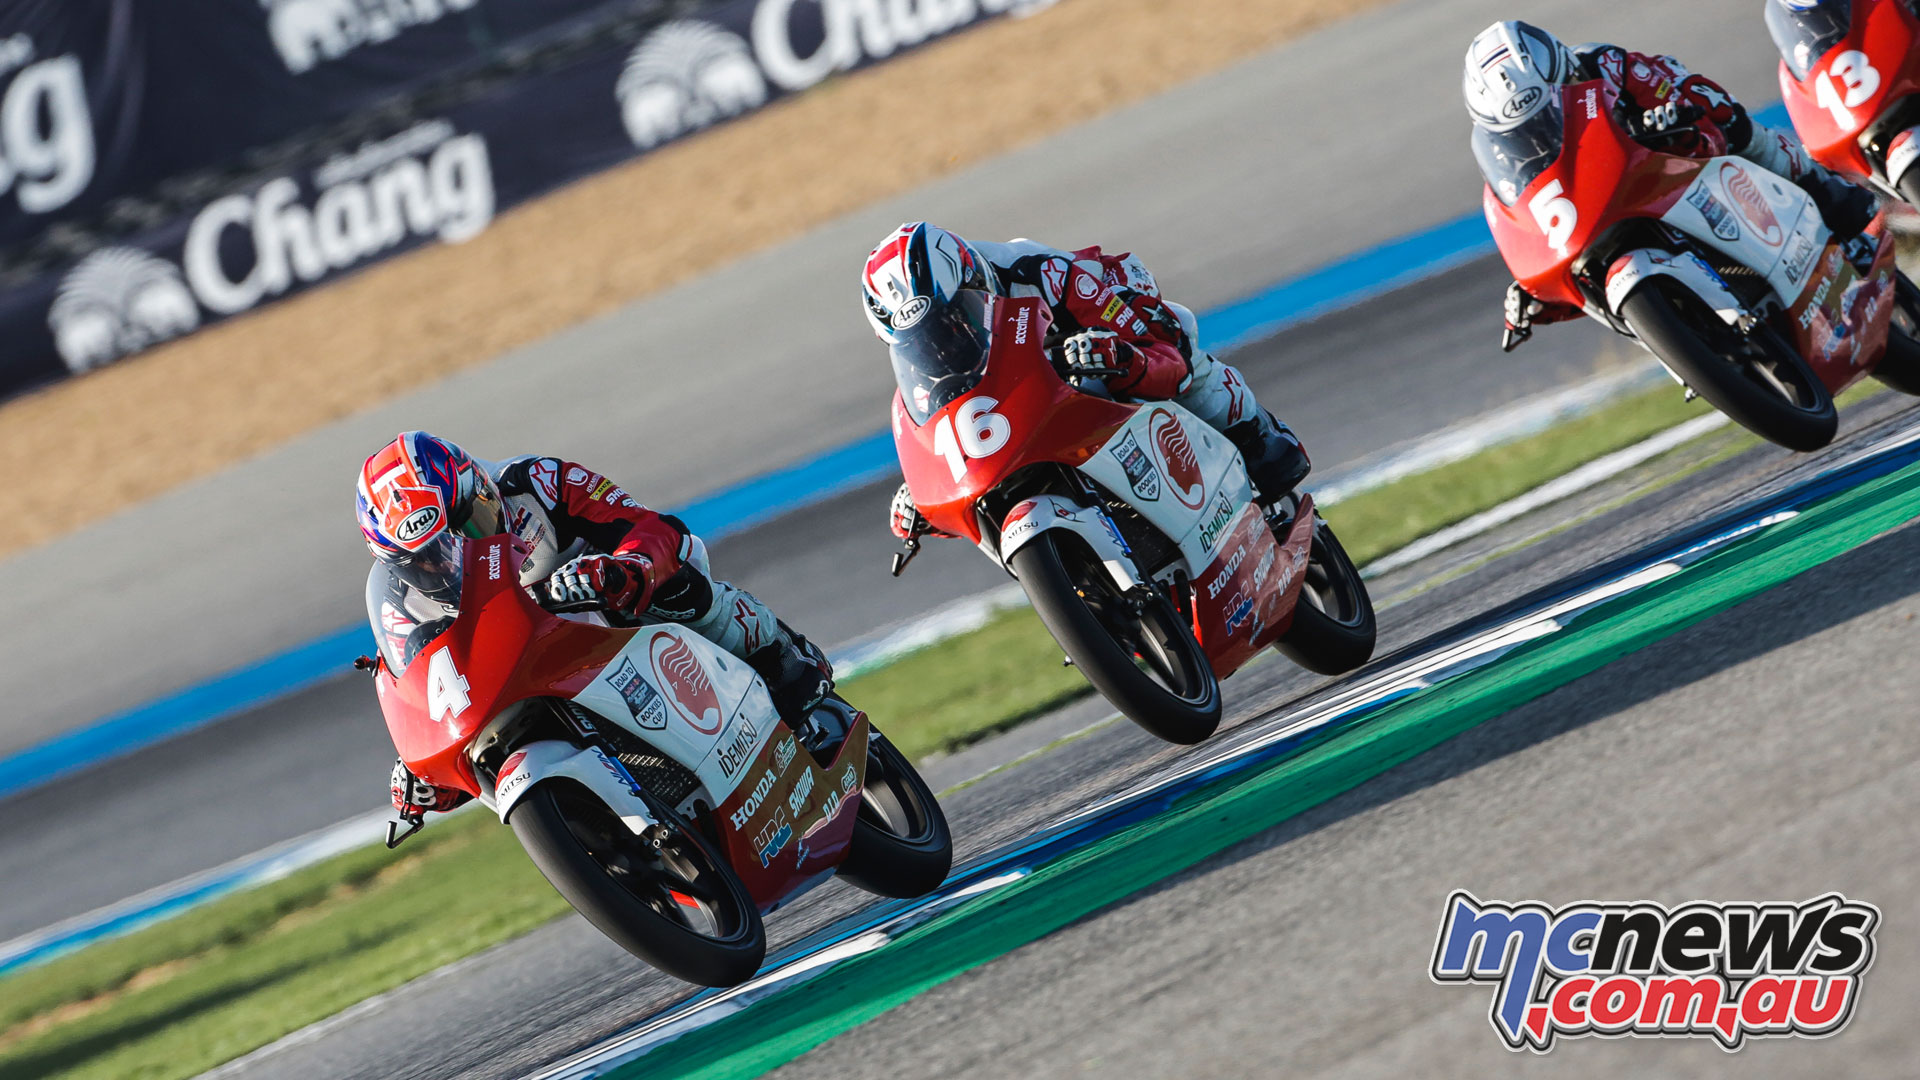 ATC Rnd Thailand Afridza Munandar Race ZA